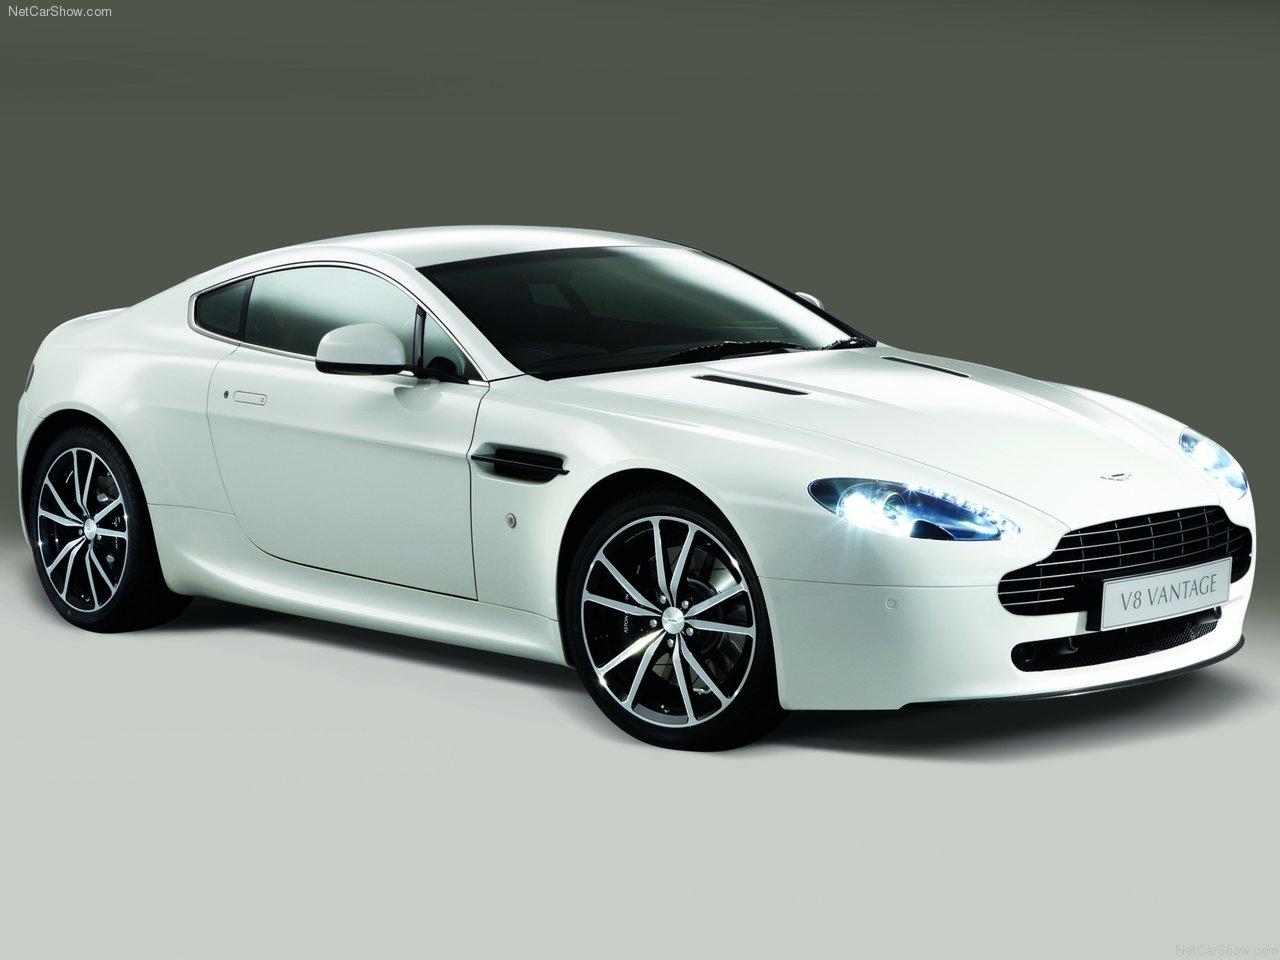 http://3.bp.blogspot.com/_eNKt9scw9RE/TDhtZ3KZ6TI/AAAAAAAAAOw/S-697PTT2pg/s1600/Aston+Martin+V8+Vantage+N420+2011+road+car.jpg